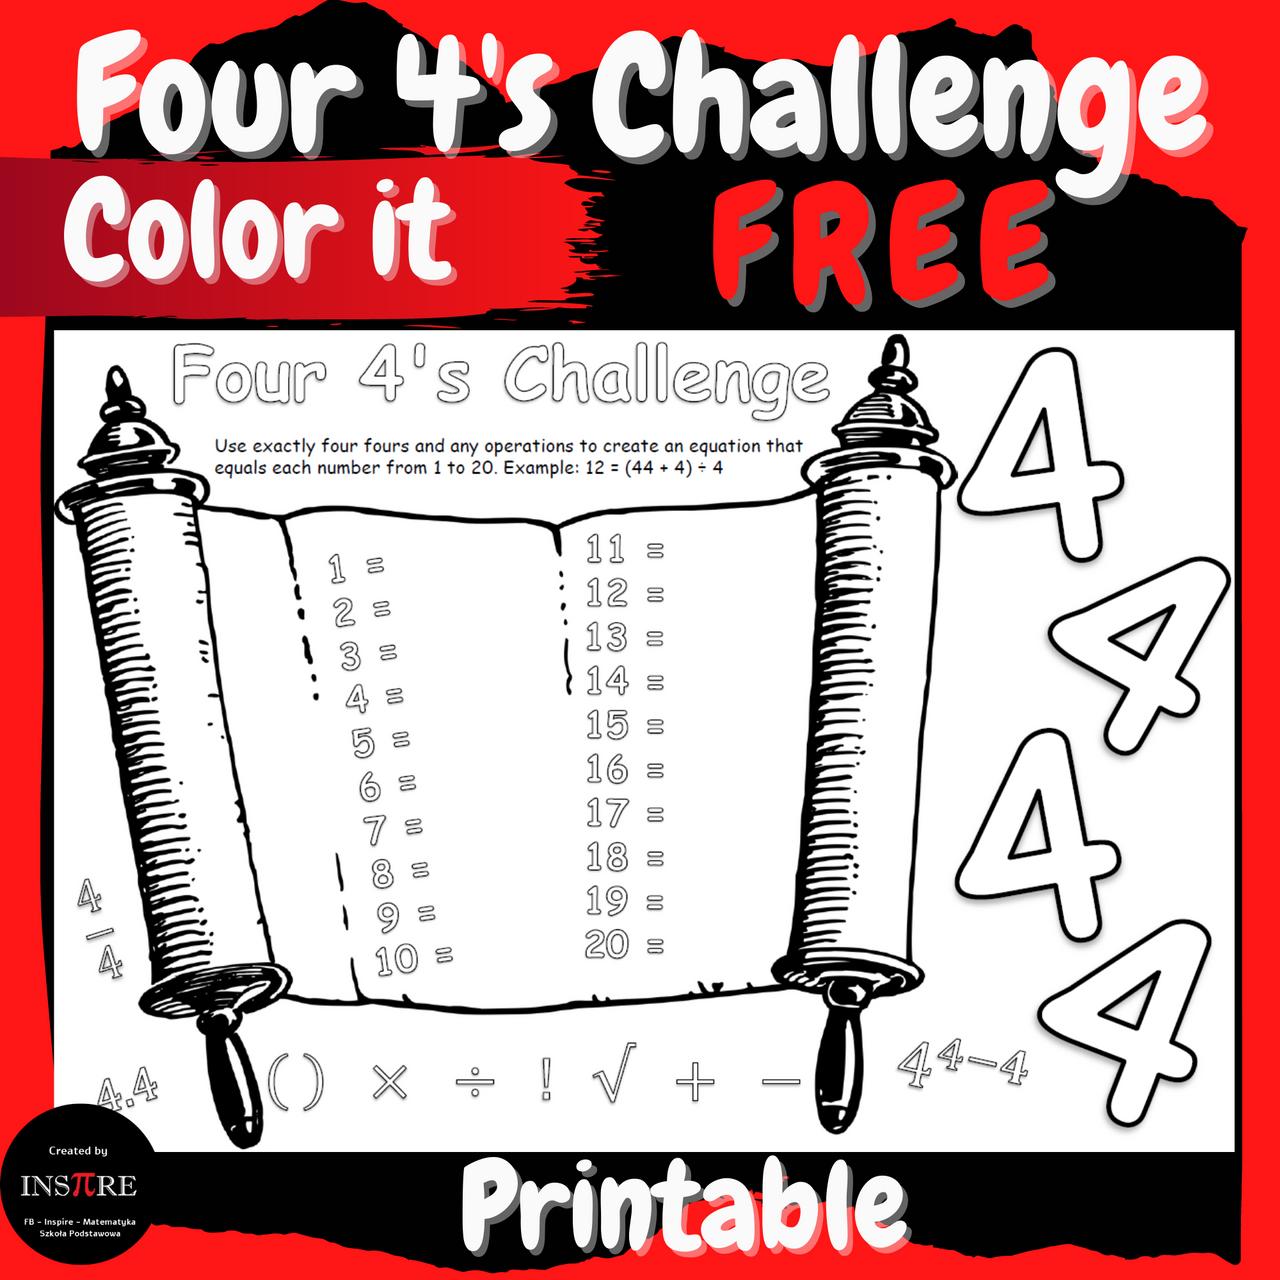 FREE Back to School Activities Four 4's Challenge Math & Art Bulletin Board Idea